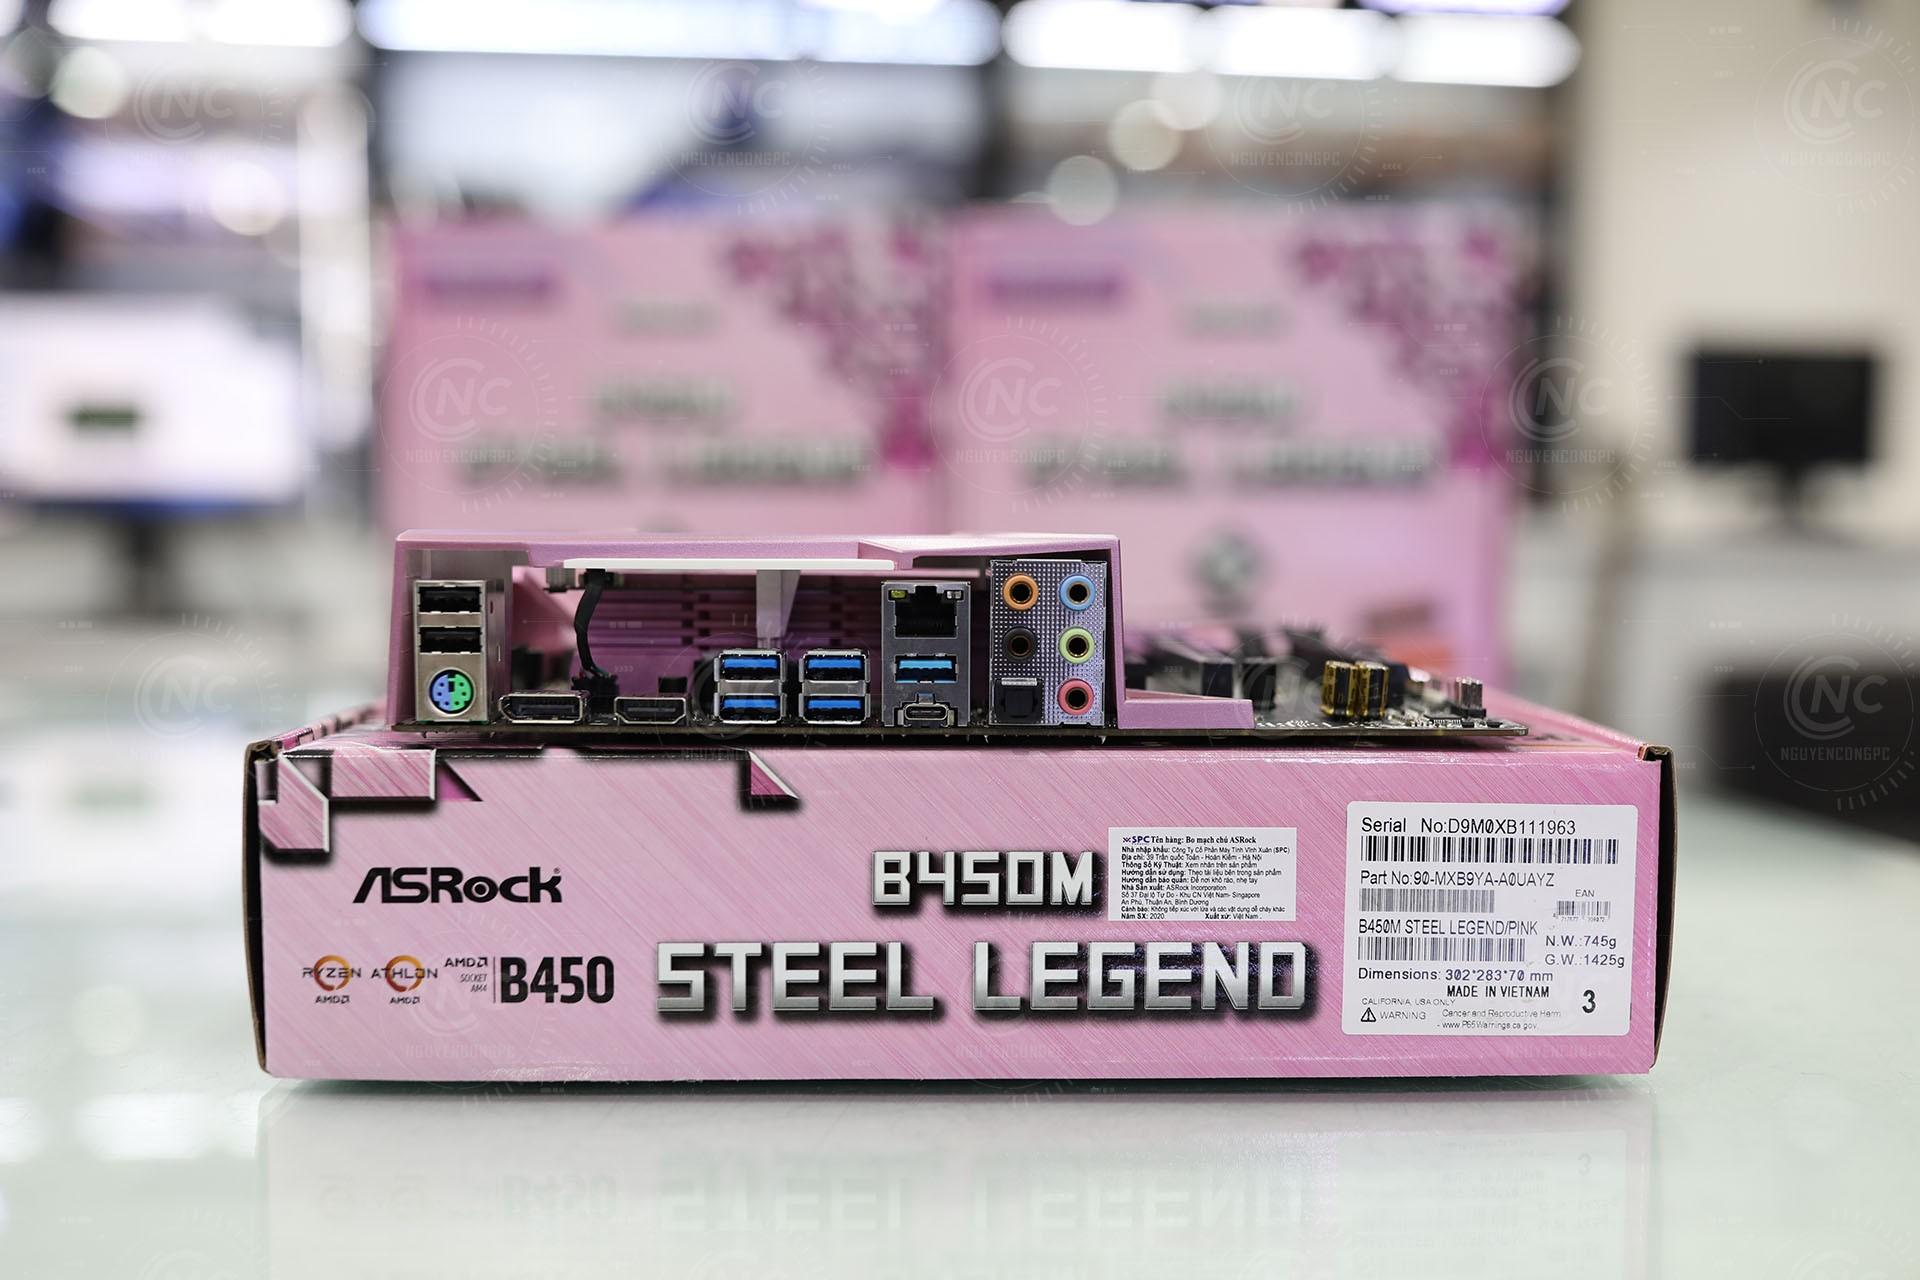 mainboard-asrock-b450m-steel-legend-pink-edition-8